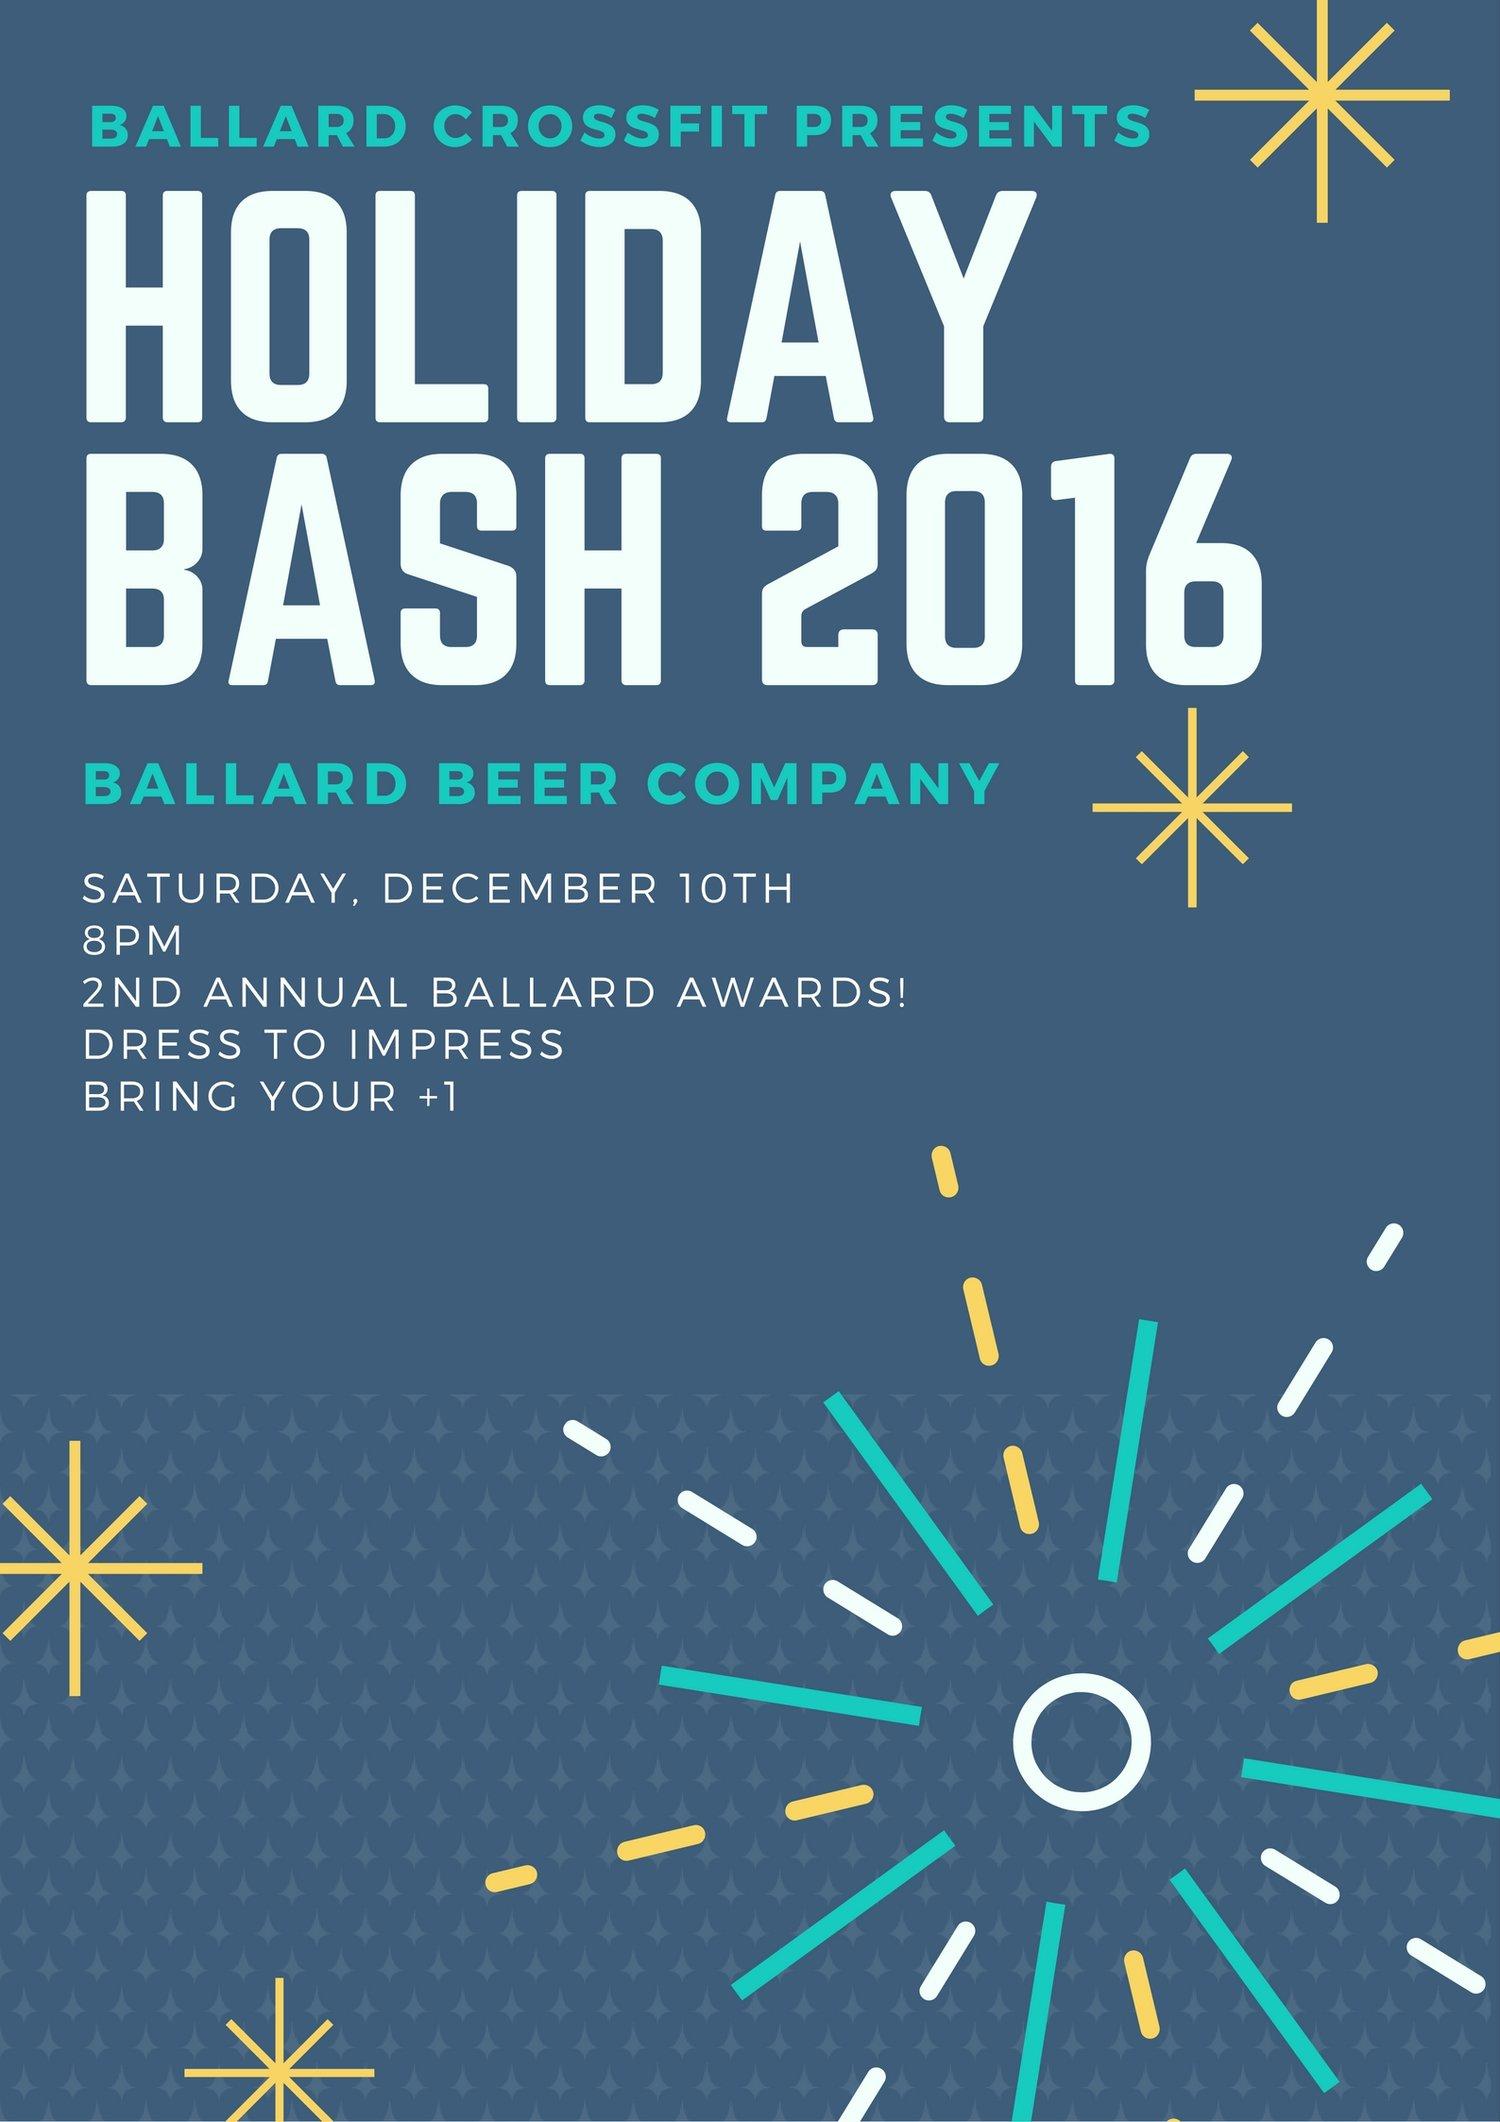 2016 holiday bash! — ballard crossfit